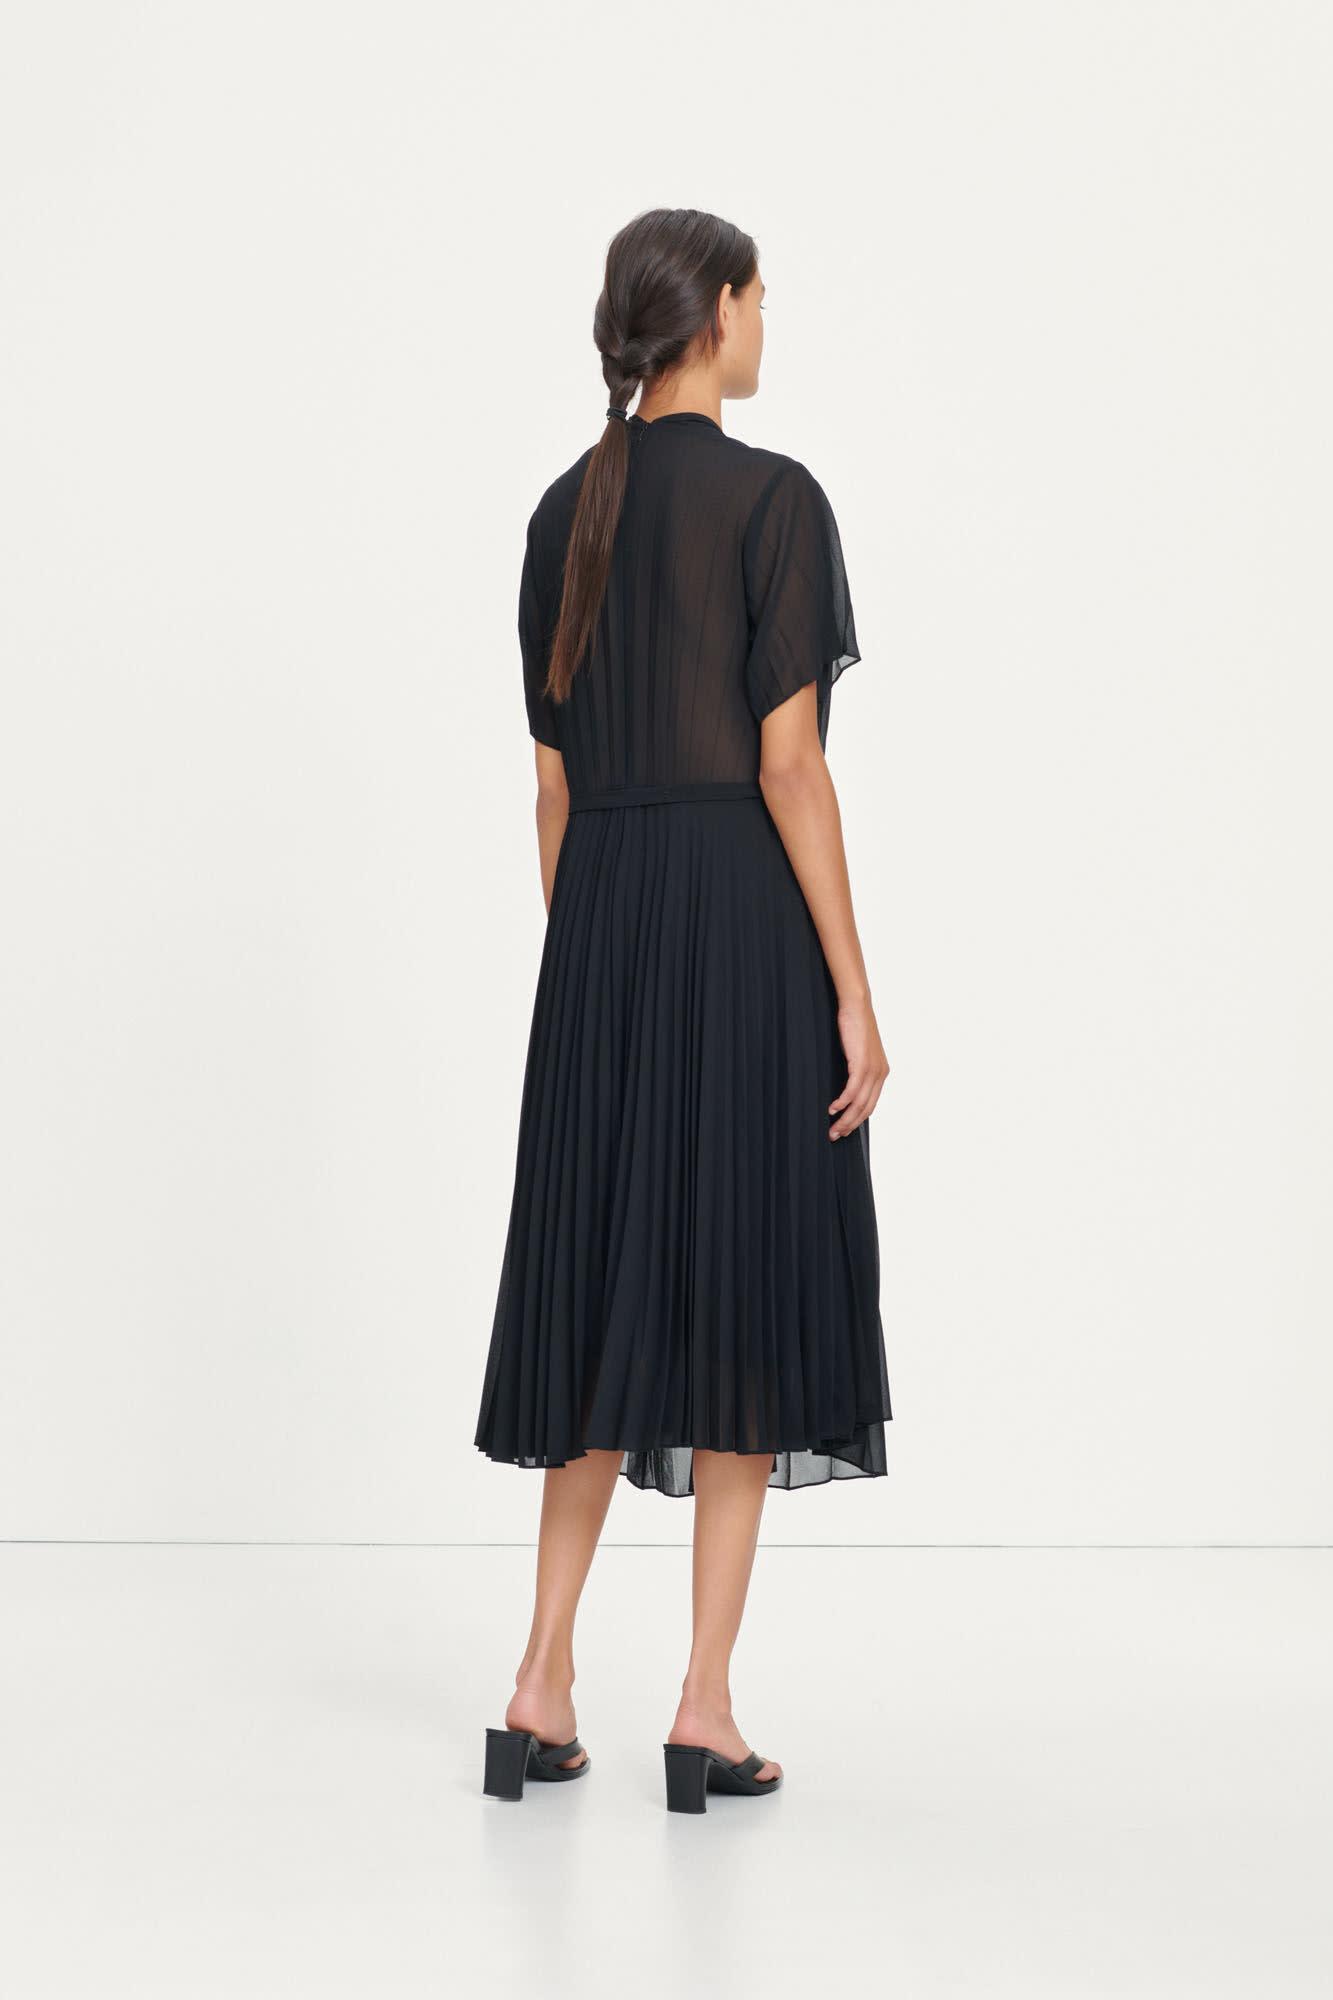 Wala Short Sleeve Pleaded Dress Black-4